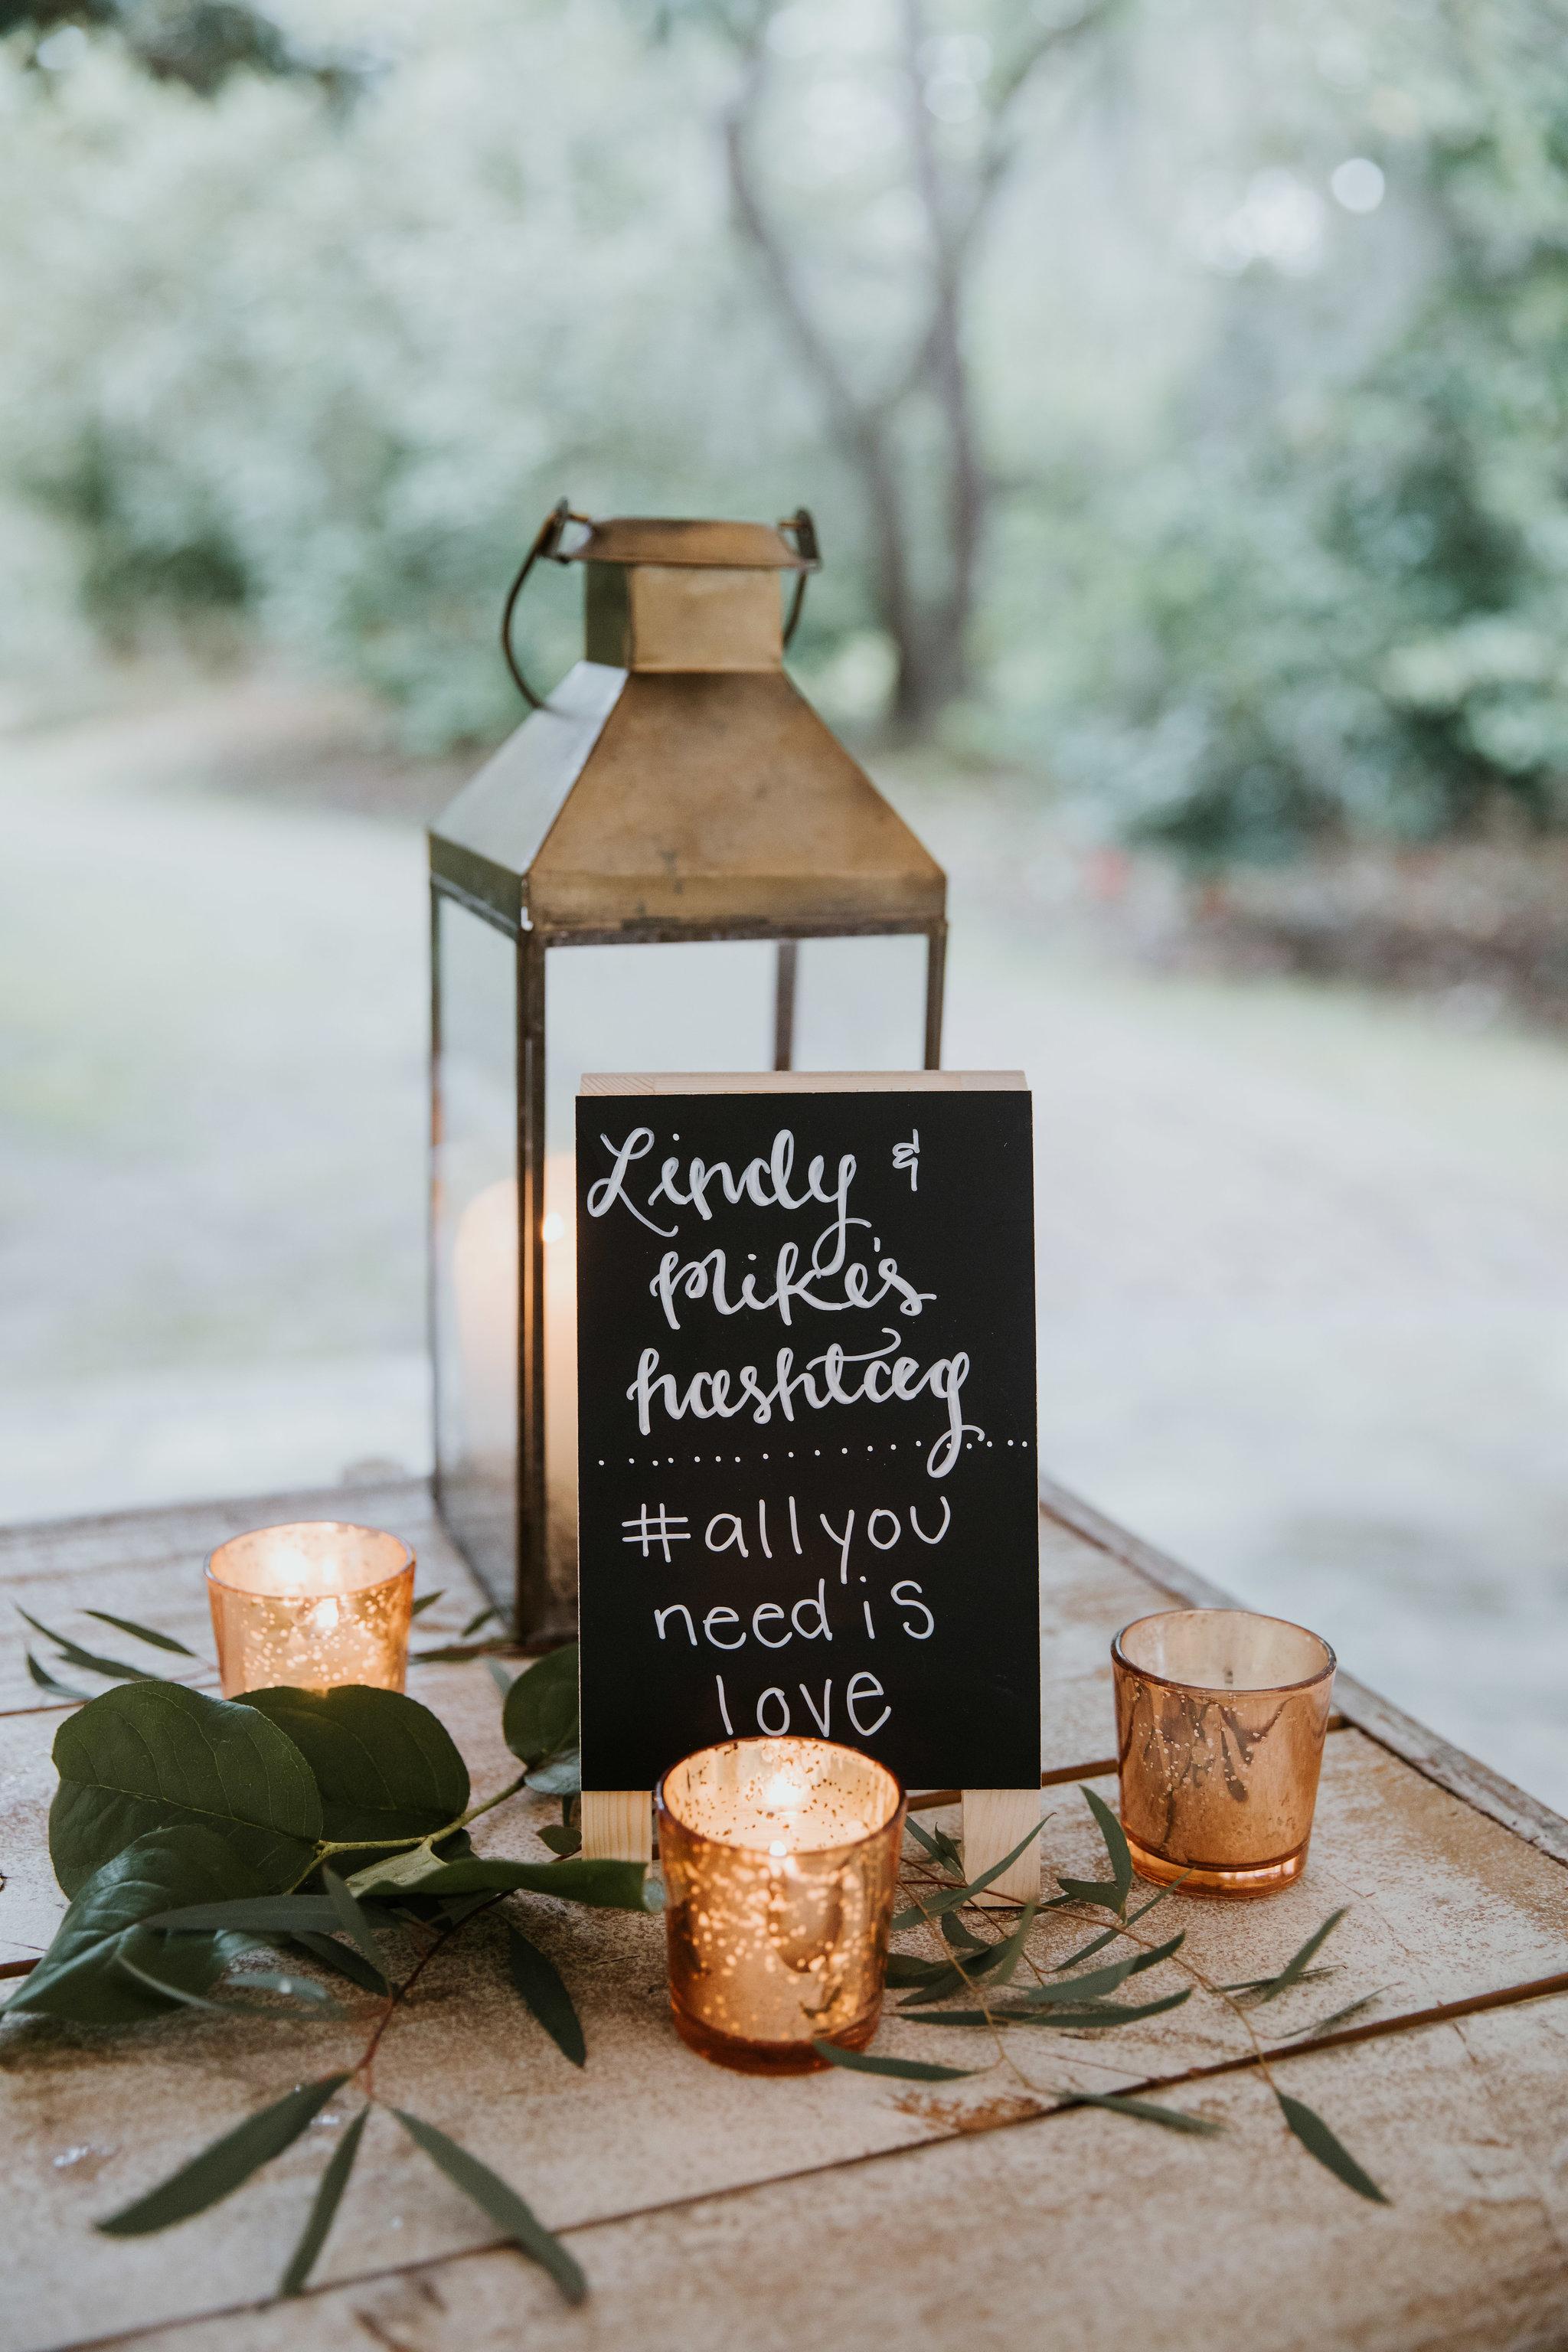 Legare-Waring-House-Charleston-SC-wedding-portrait-photography-457.jpg